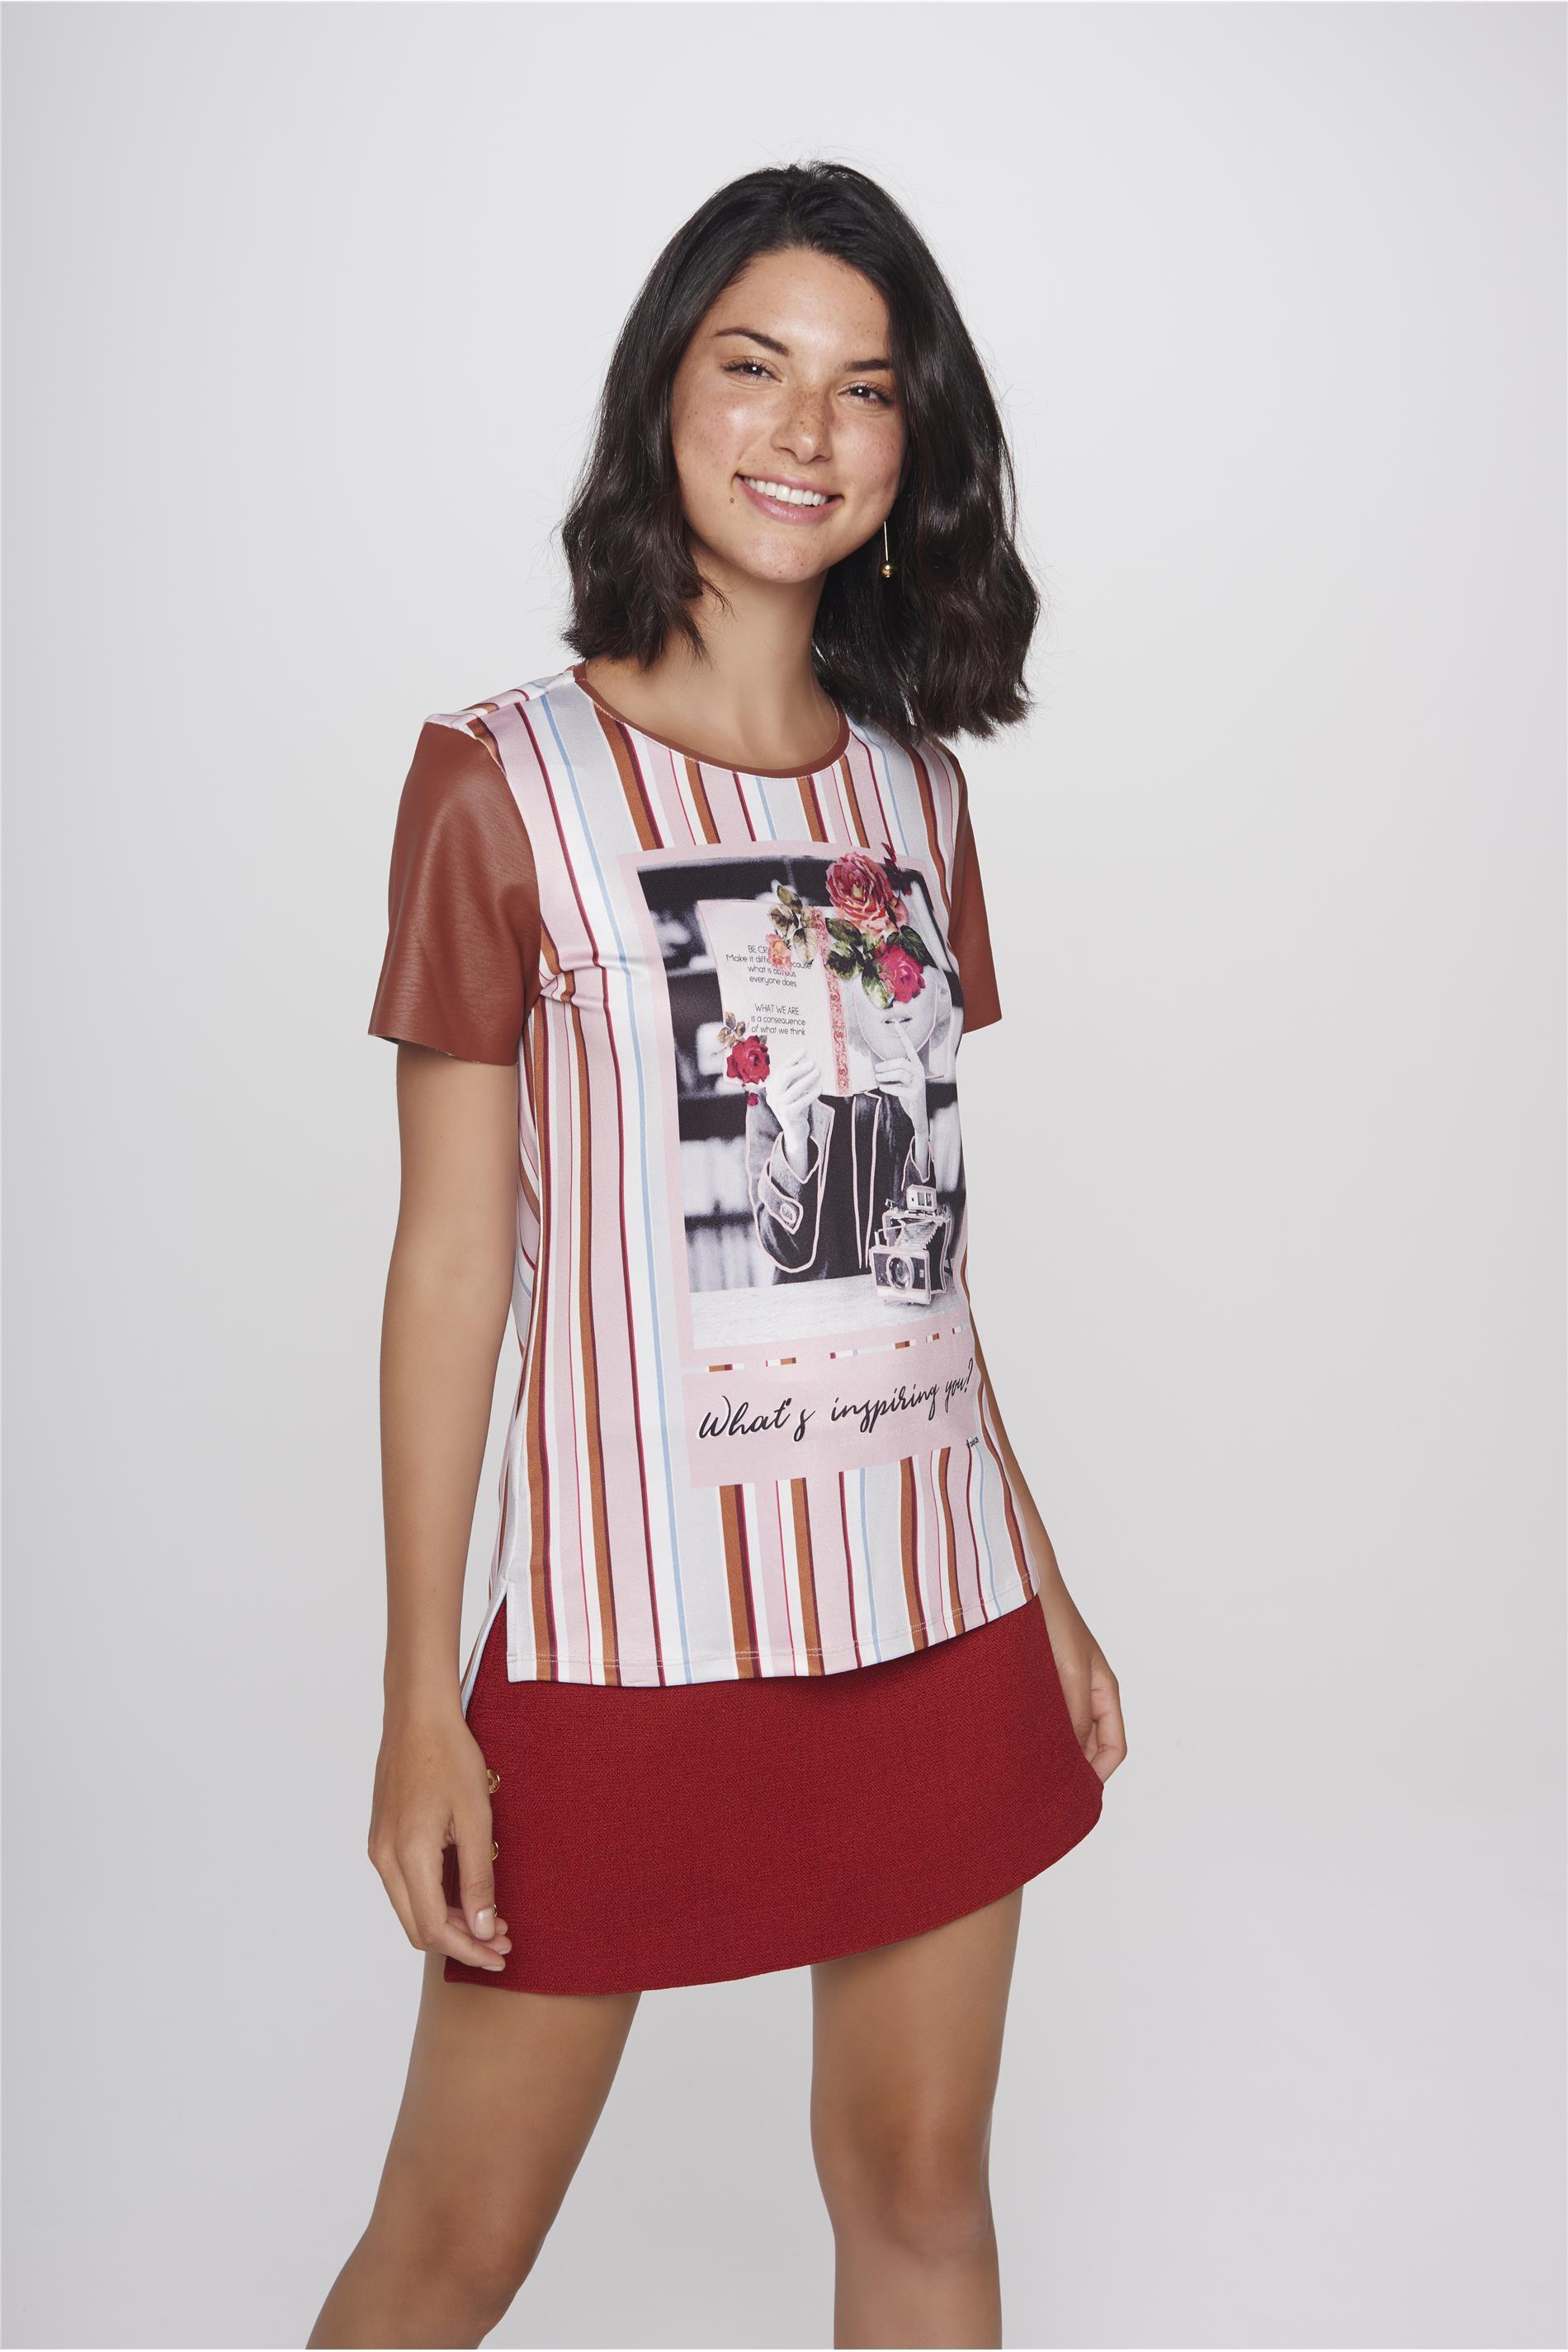 bb42d2976f Damyller · Moda Feminina · Blusas · Camiseta. abrir